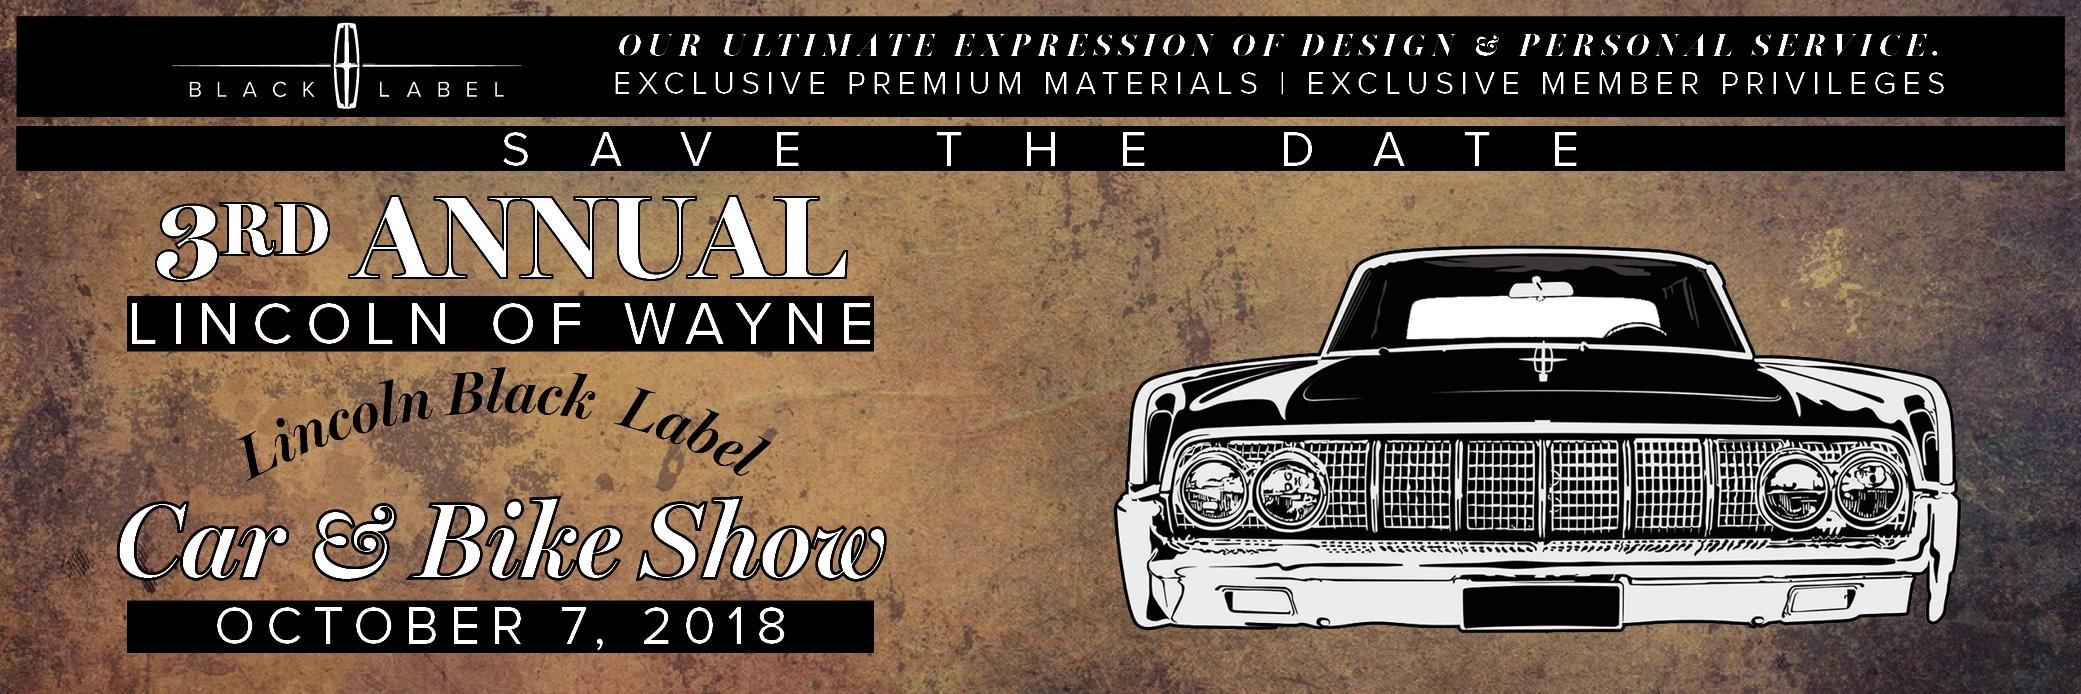 Lincoln Of Wayne Lincoln Black Label Car Bike Show Lincoln Of Wayne